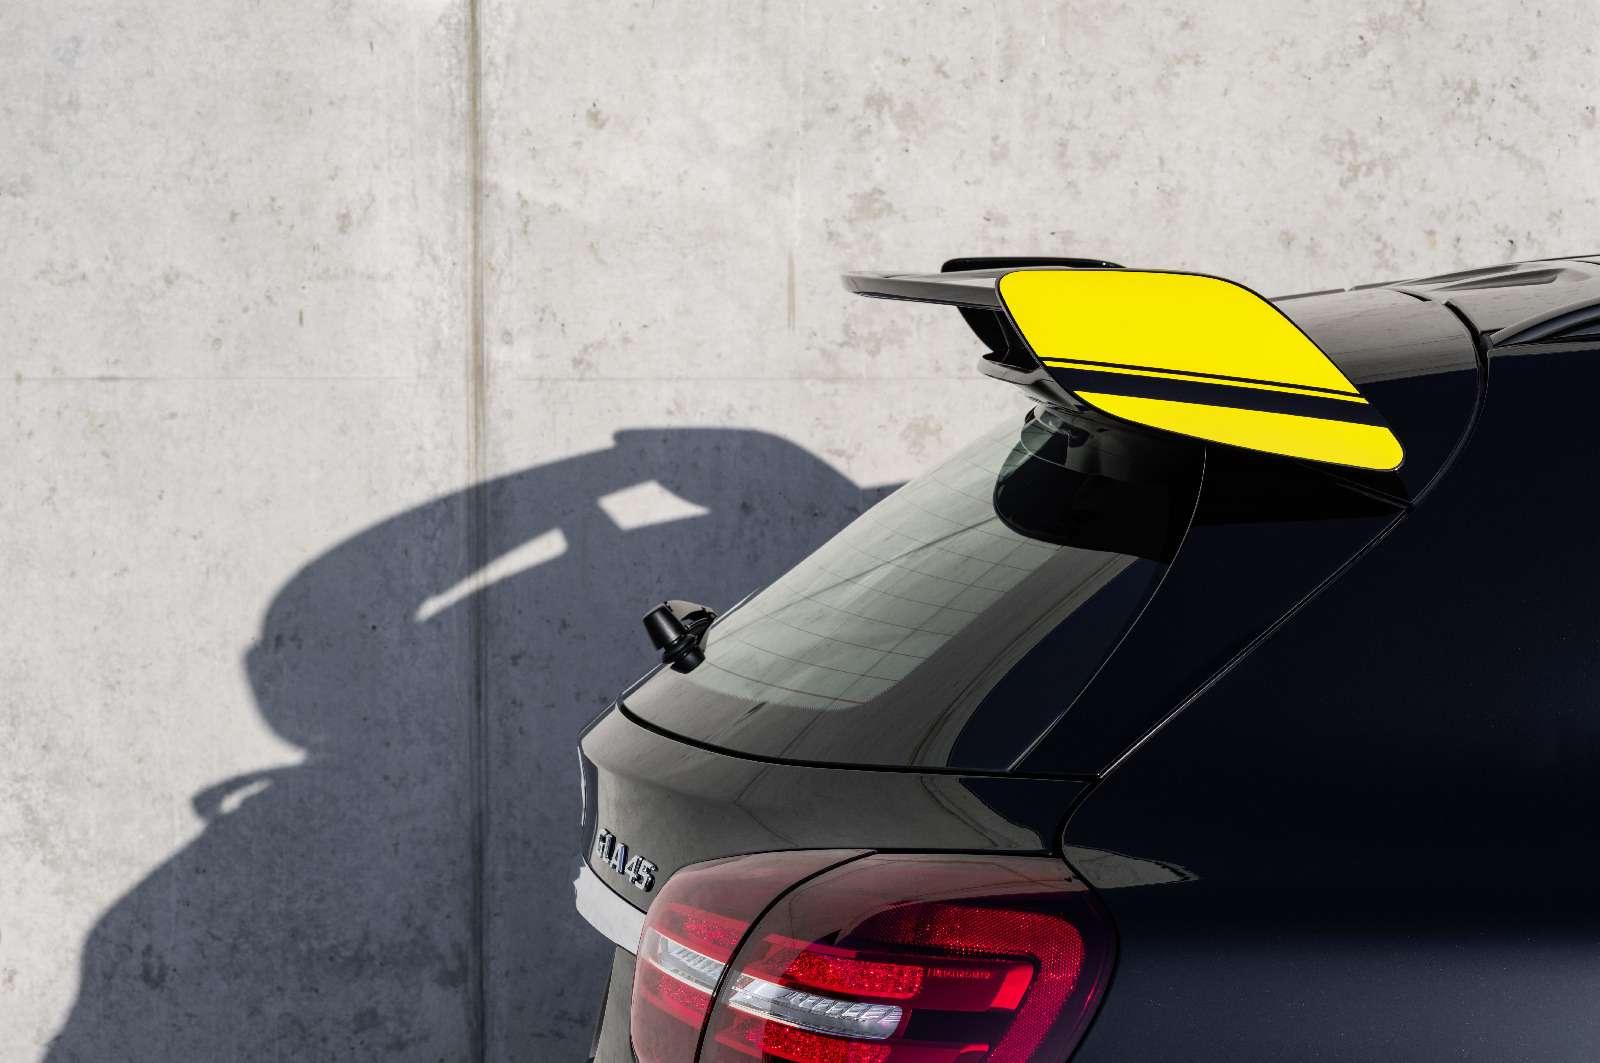 Mercedes-Benz GLA стал краше, нонепросторнее— фото 690081